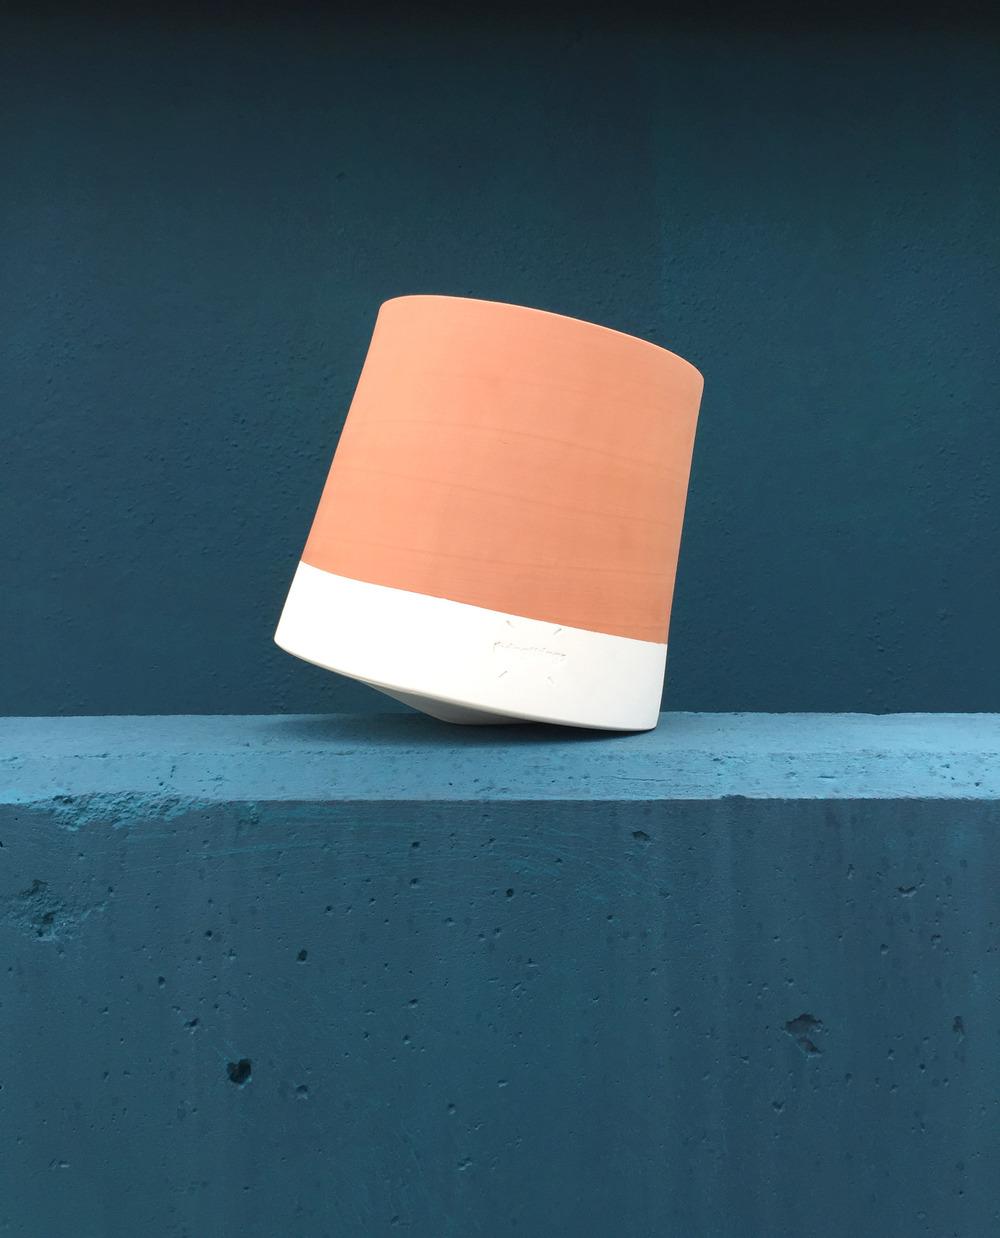 10-voltasol-studio-bag-disseny-livingthings